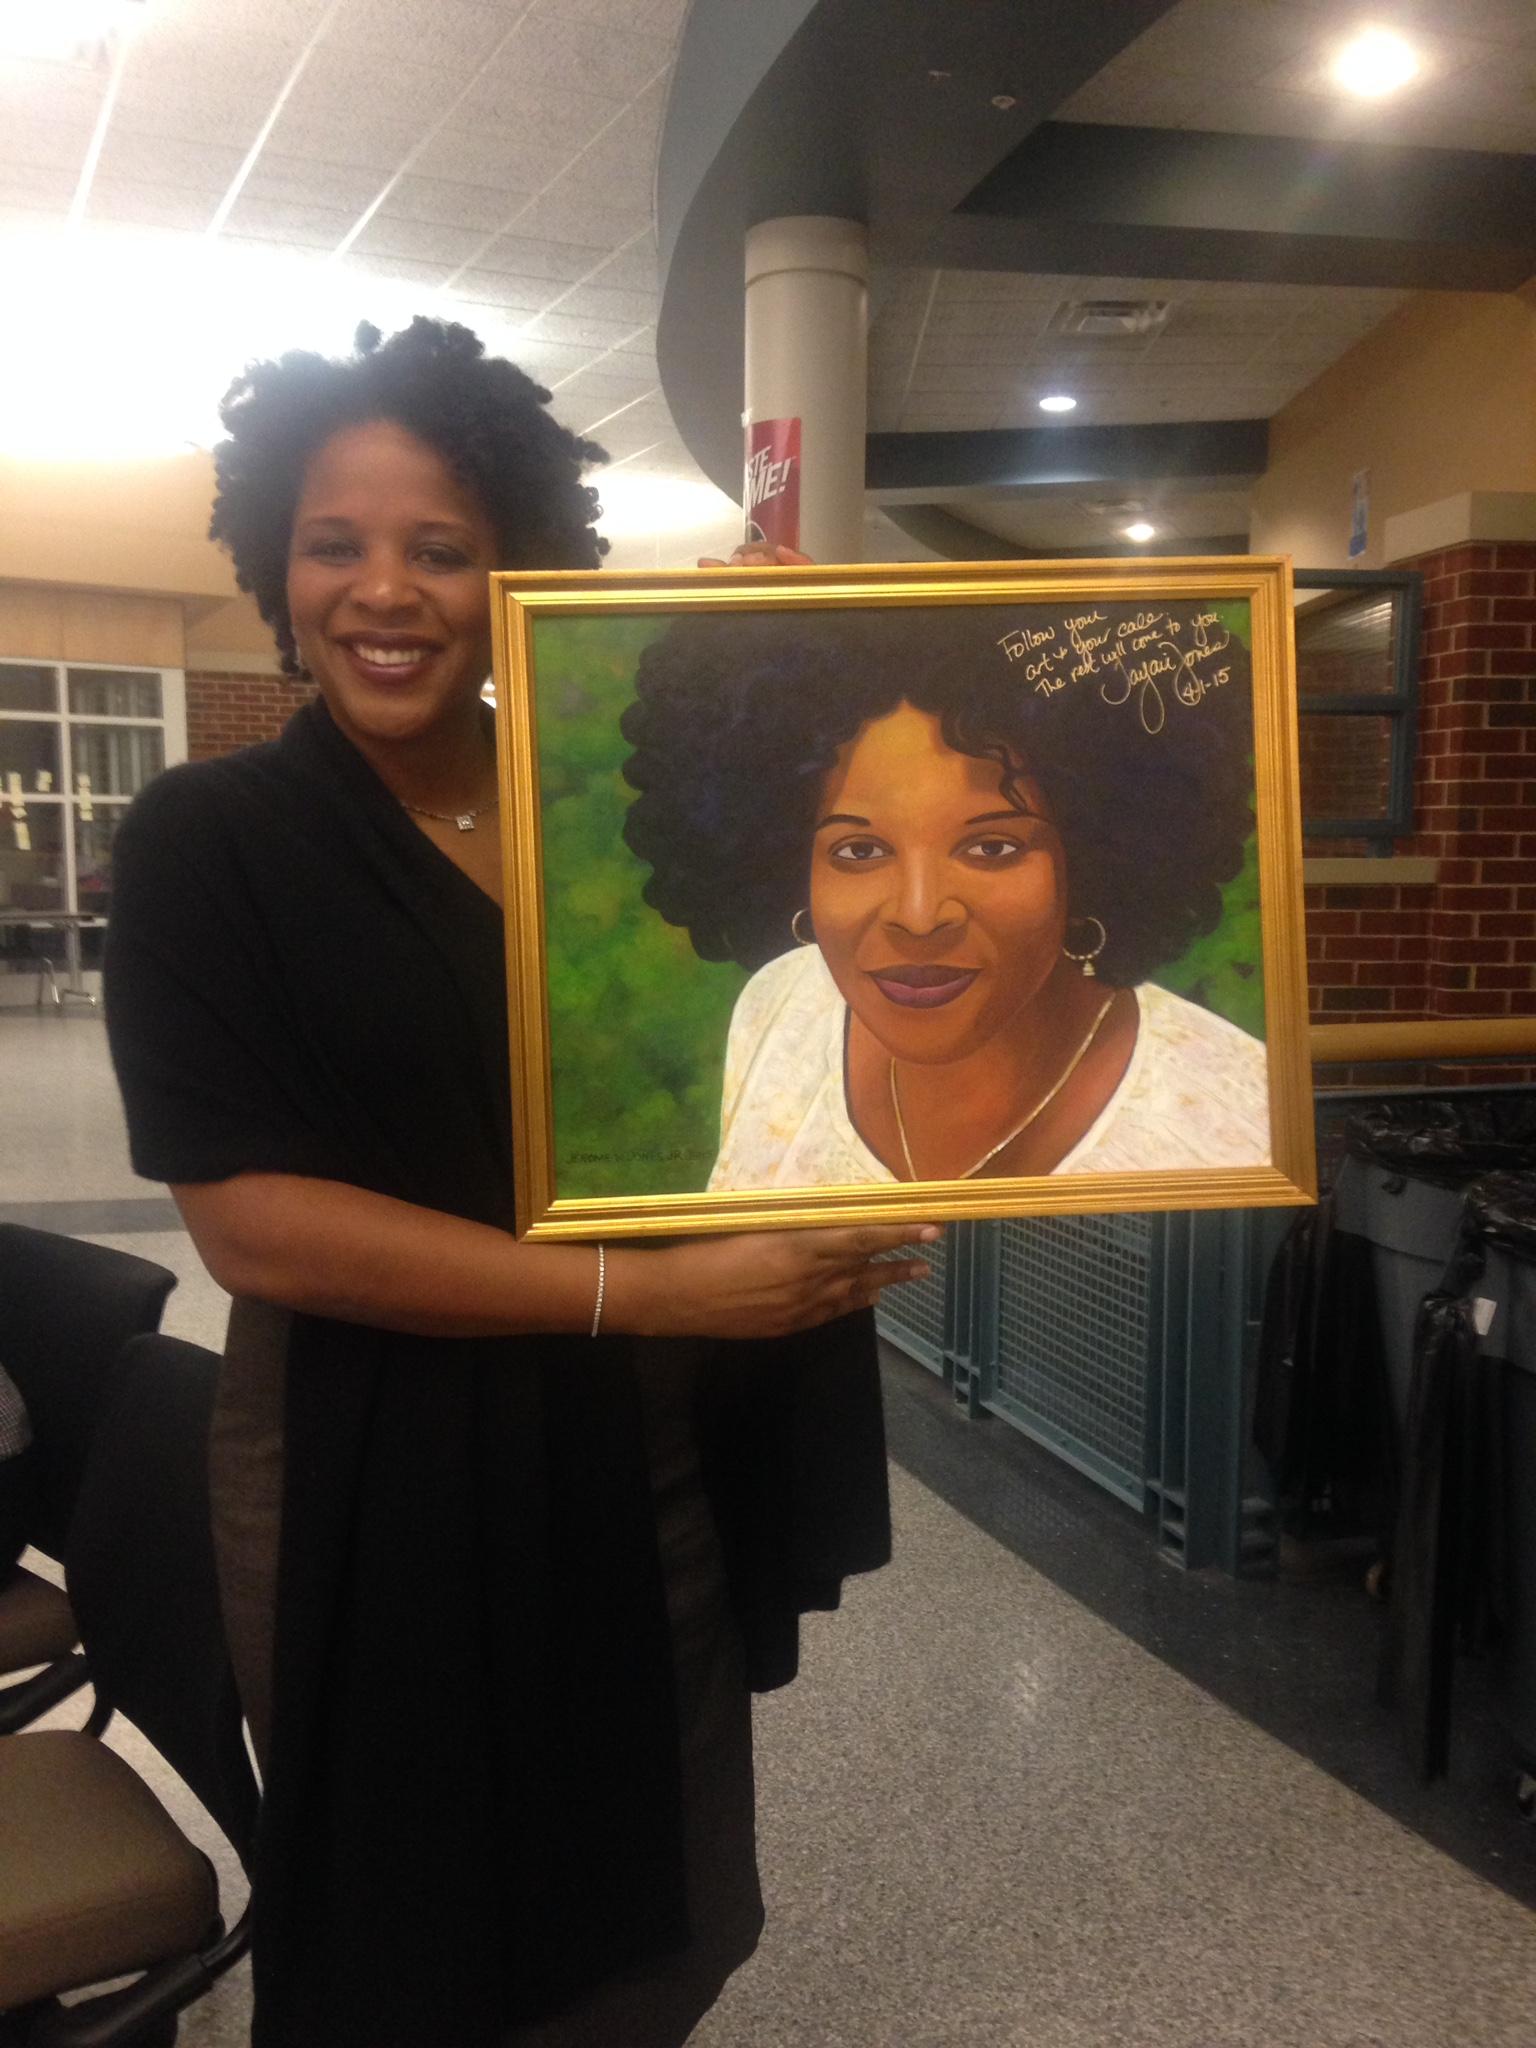 IMG: Tayari Jones holding a painting of herself.